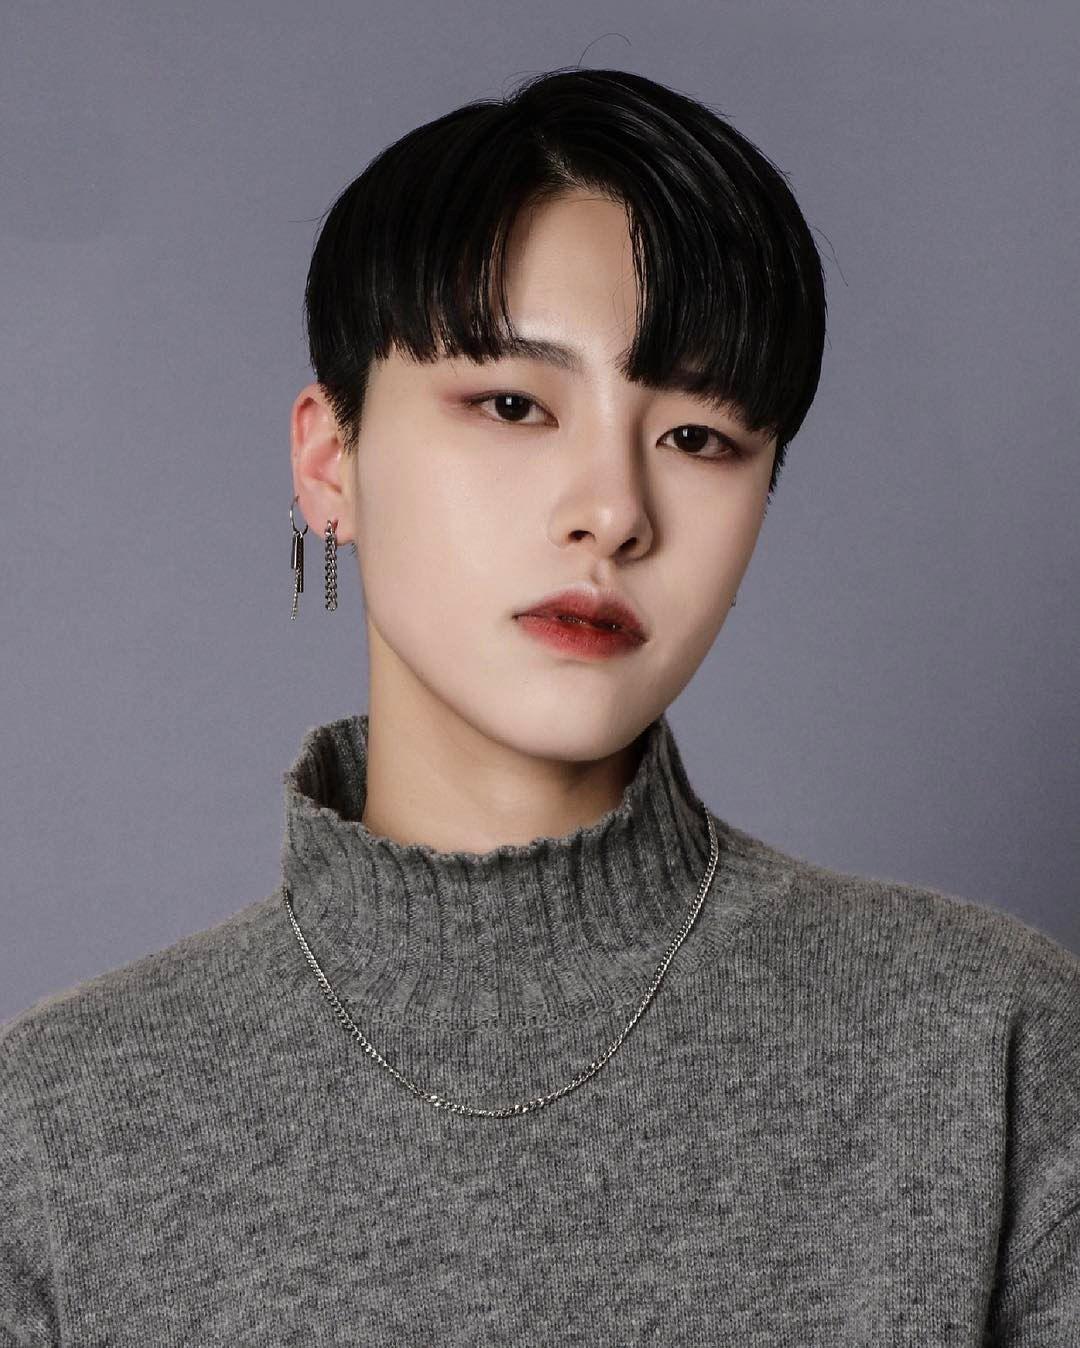 Nice Korean Haircut And Hairstyle For Boys Boys Haircuts Boy Hairstyles Hair Style Korea